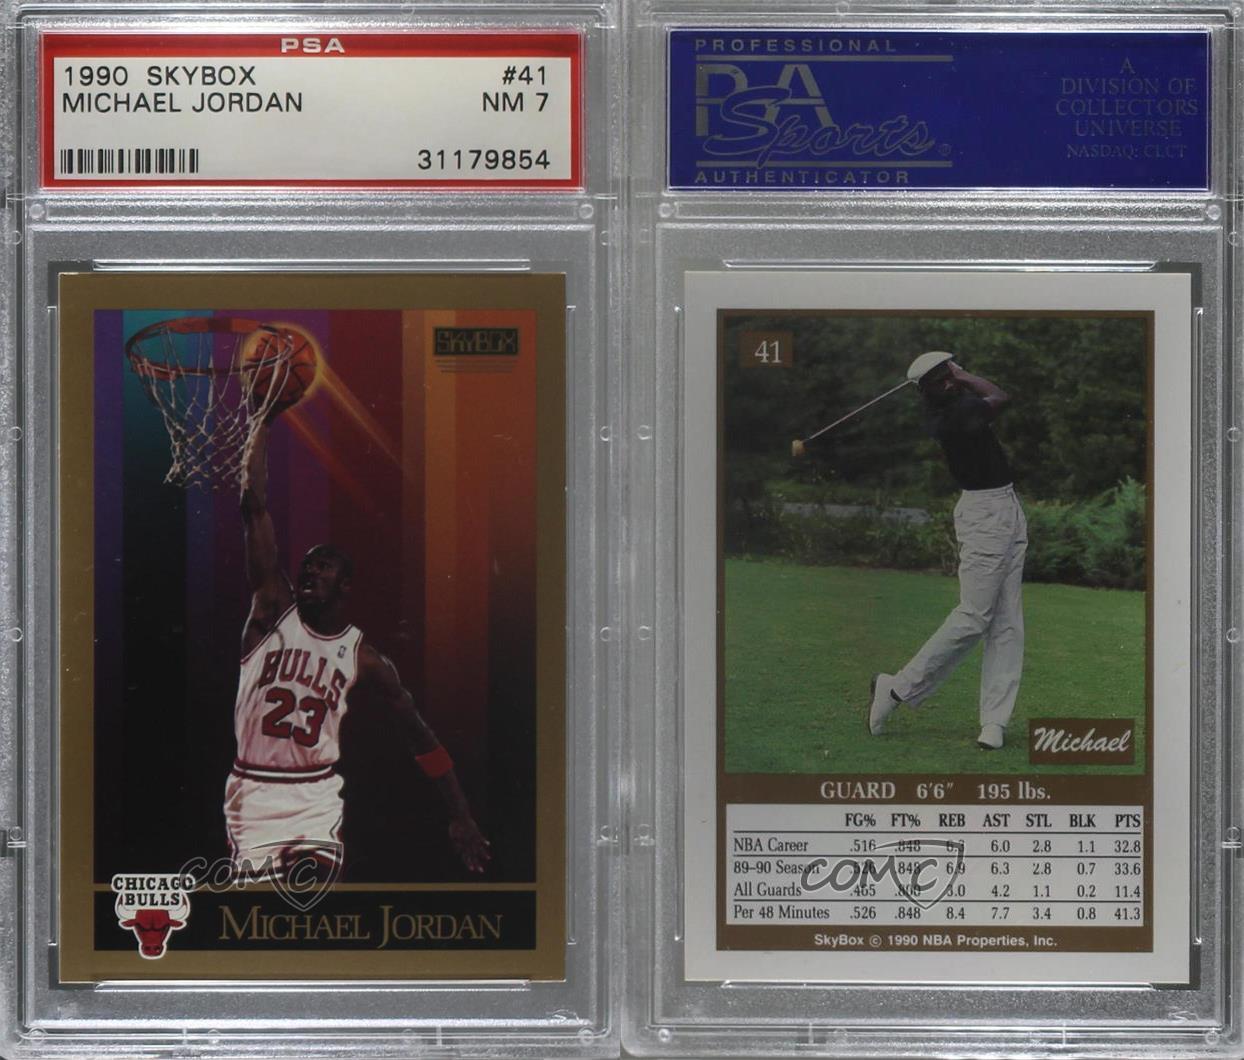 1990-91-Skybox-41-Michael-Jordan-PSA-7-NM-Chicago-Bulls-Basketball-Card